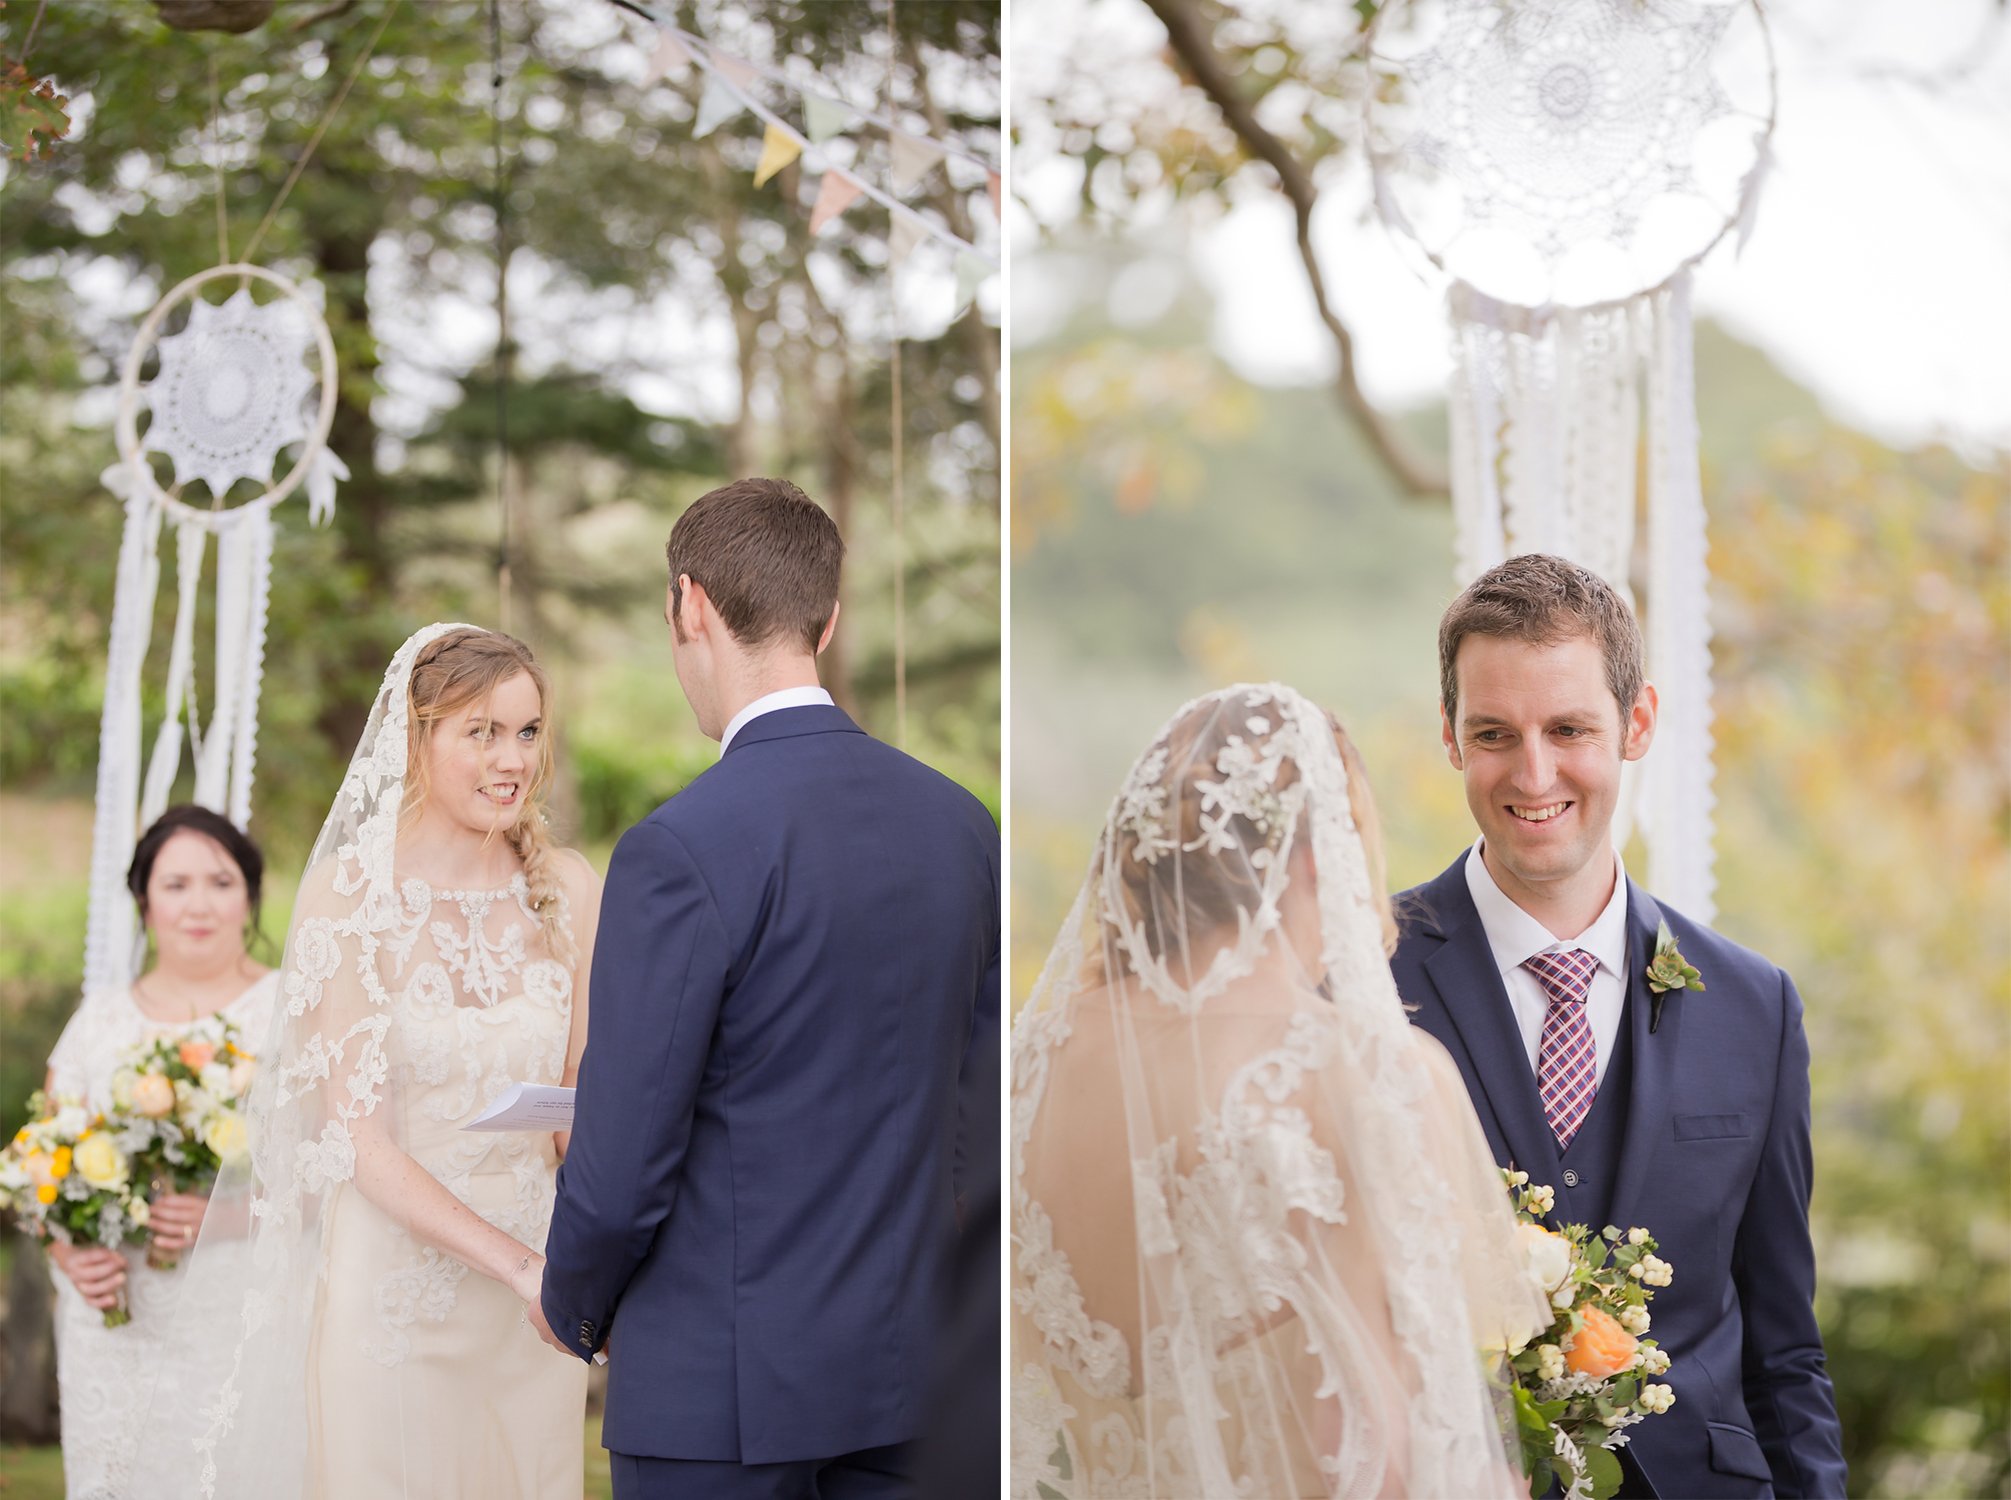 wellington wedding photography NZ - 1384.JPG